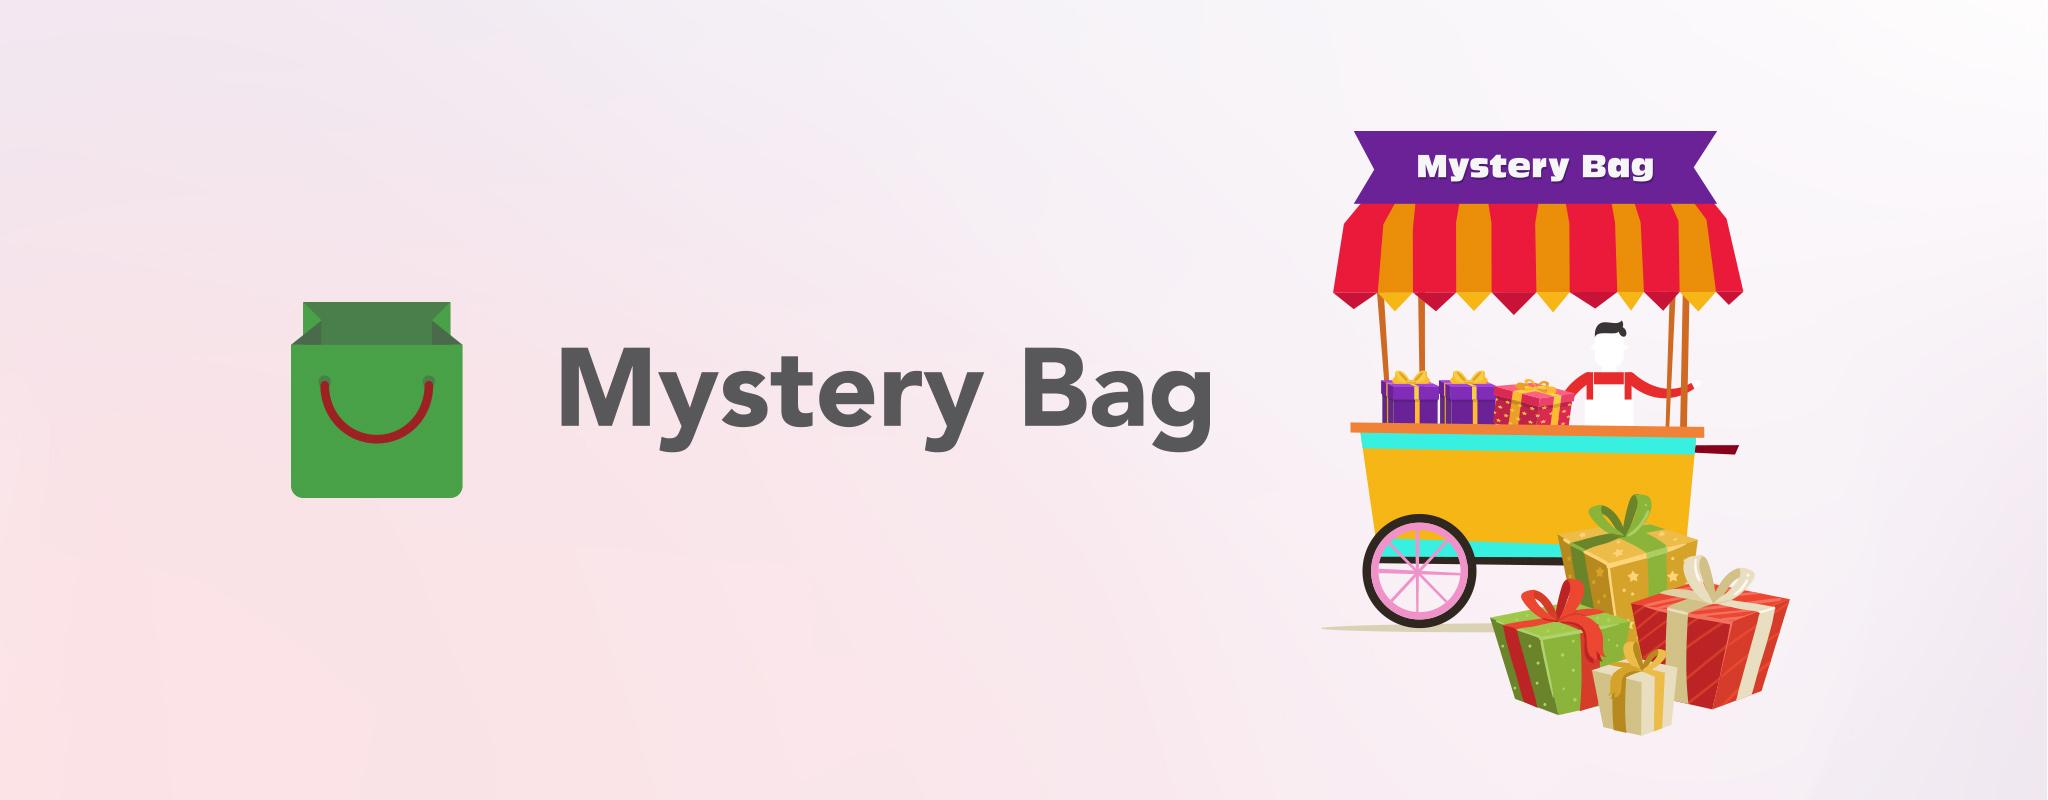 Mystery Bag Foodmandu Online Food Festival